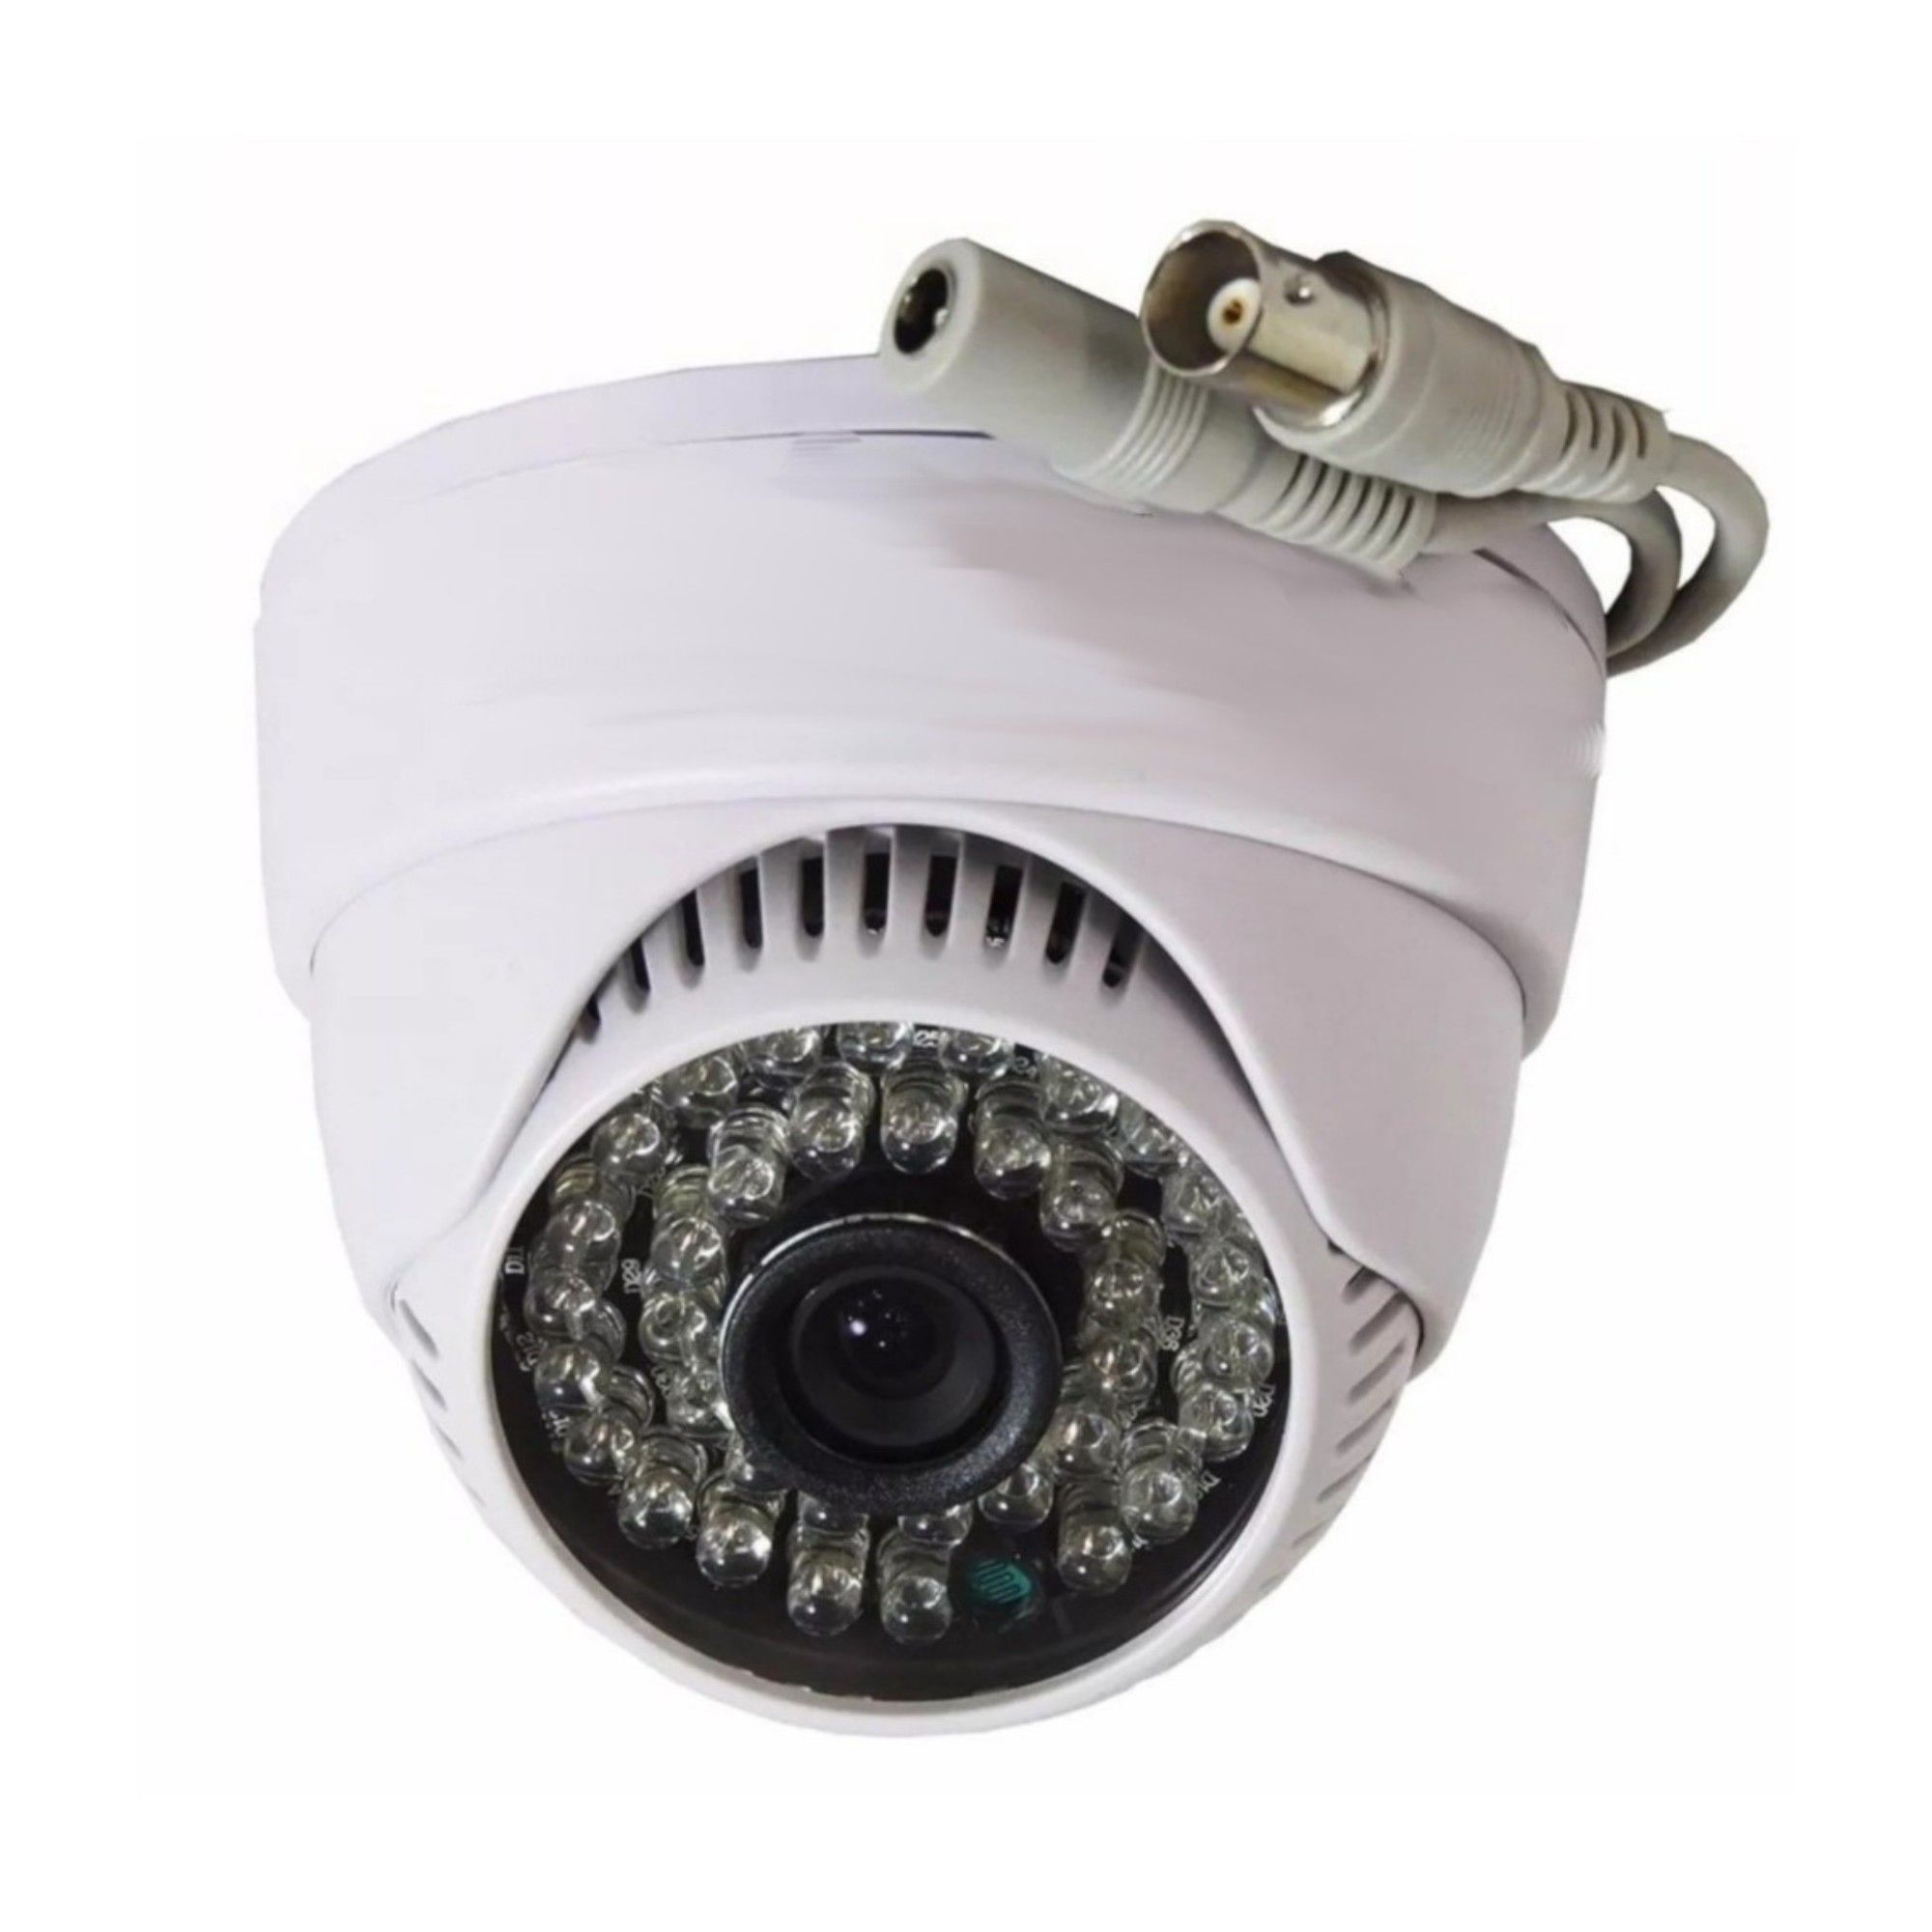 Kit CFTV Jortan Completo 14 Câmeras AHD 720p DVR 16 Canais